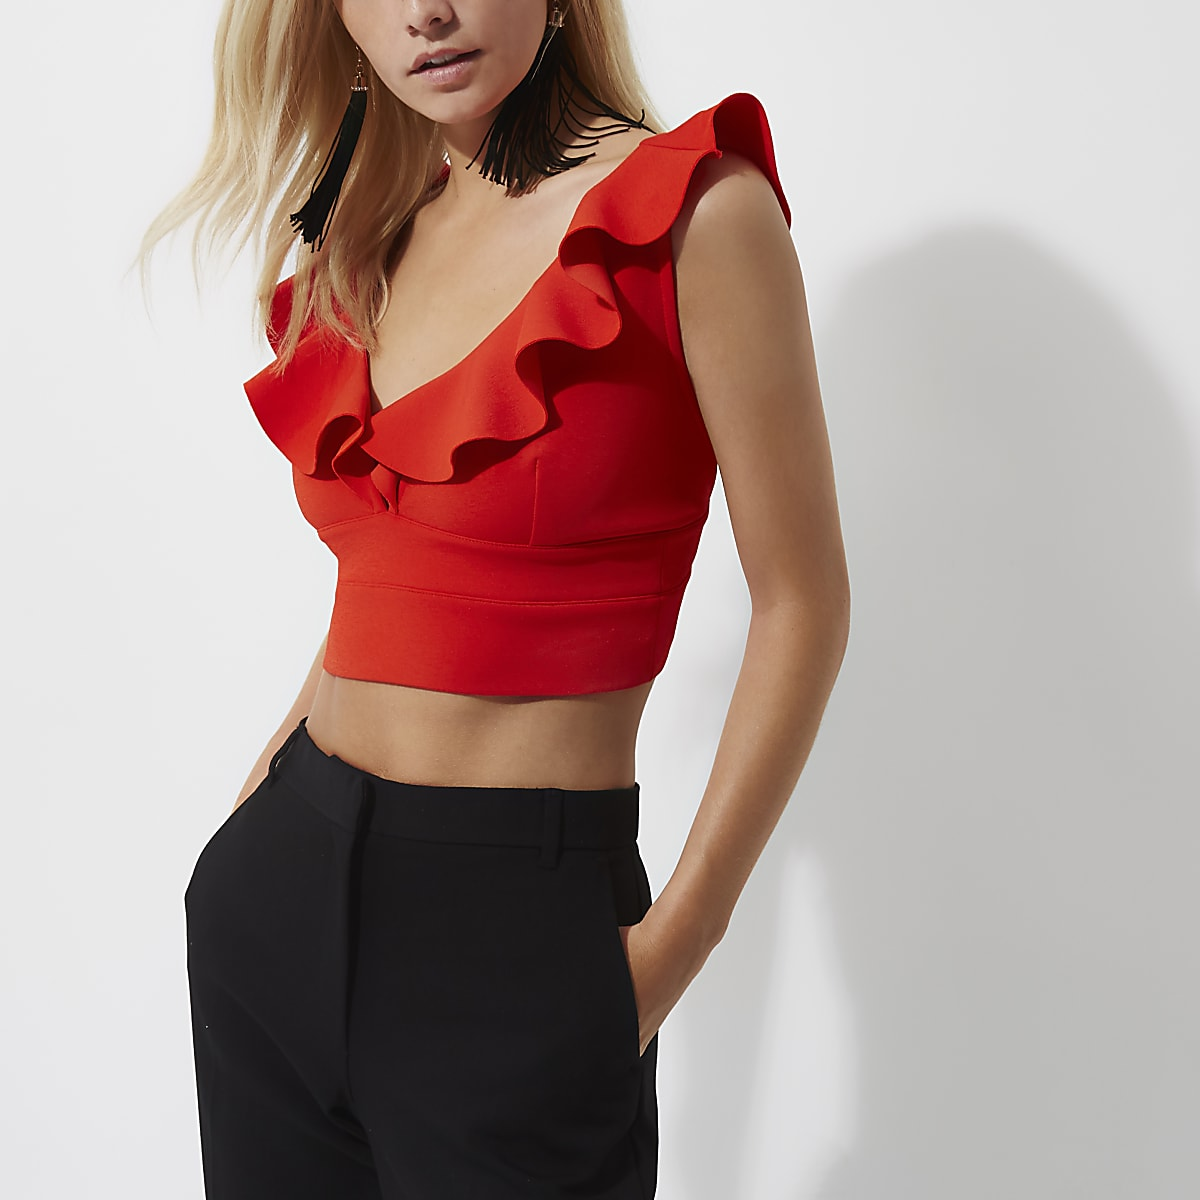 48f2278d15b Petite red frill bralet - Crop Tops   Bralets - Tops - women